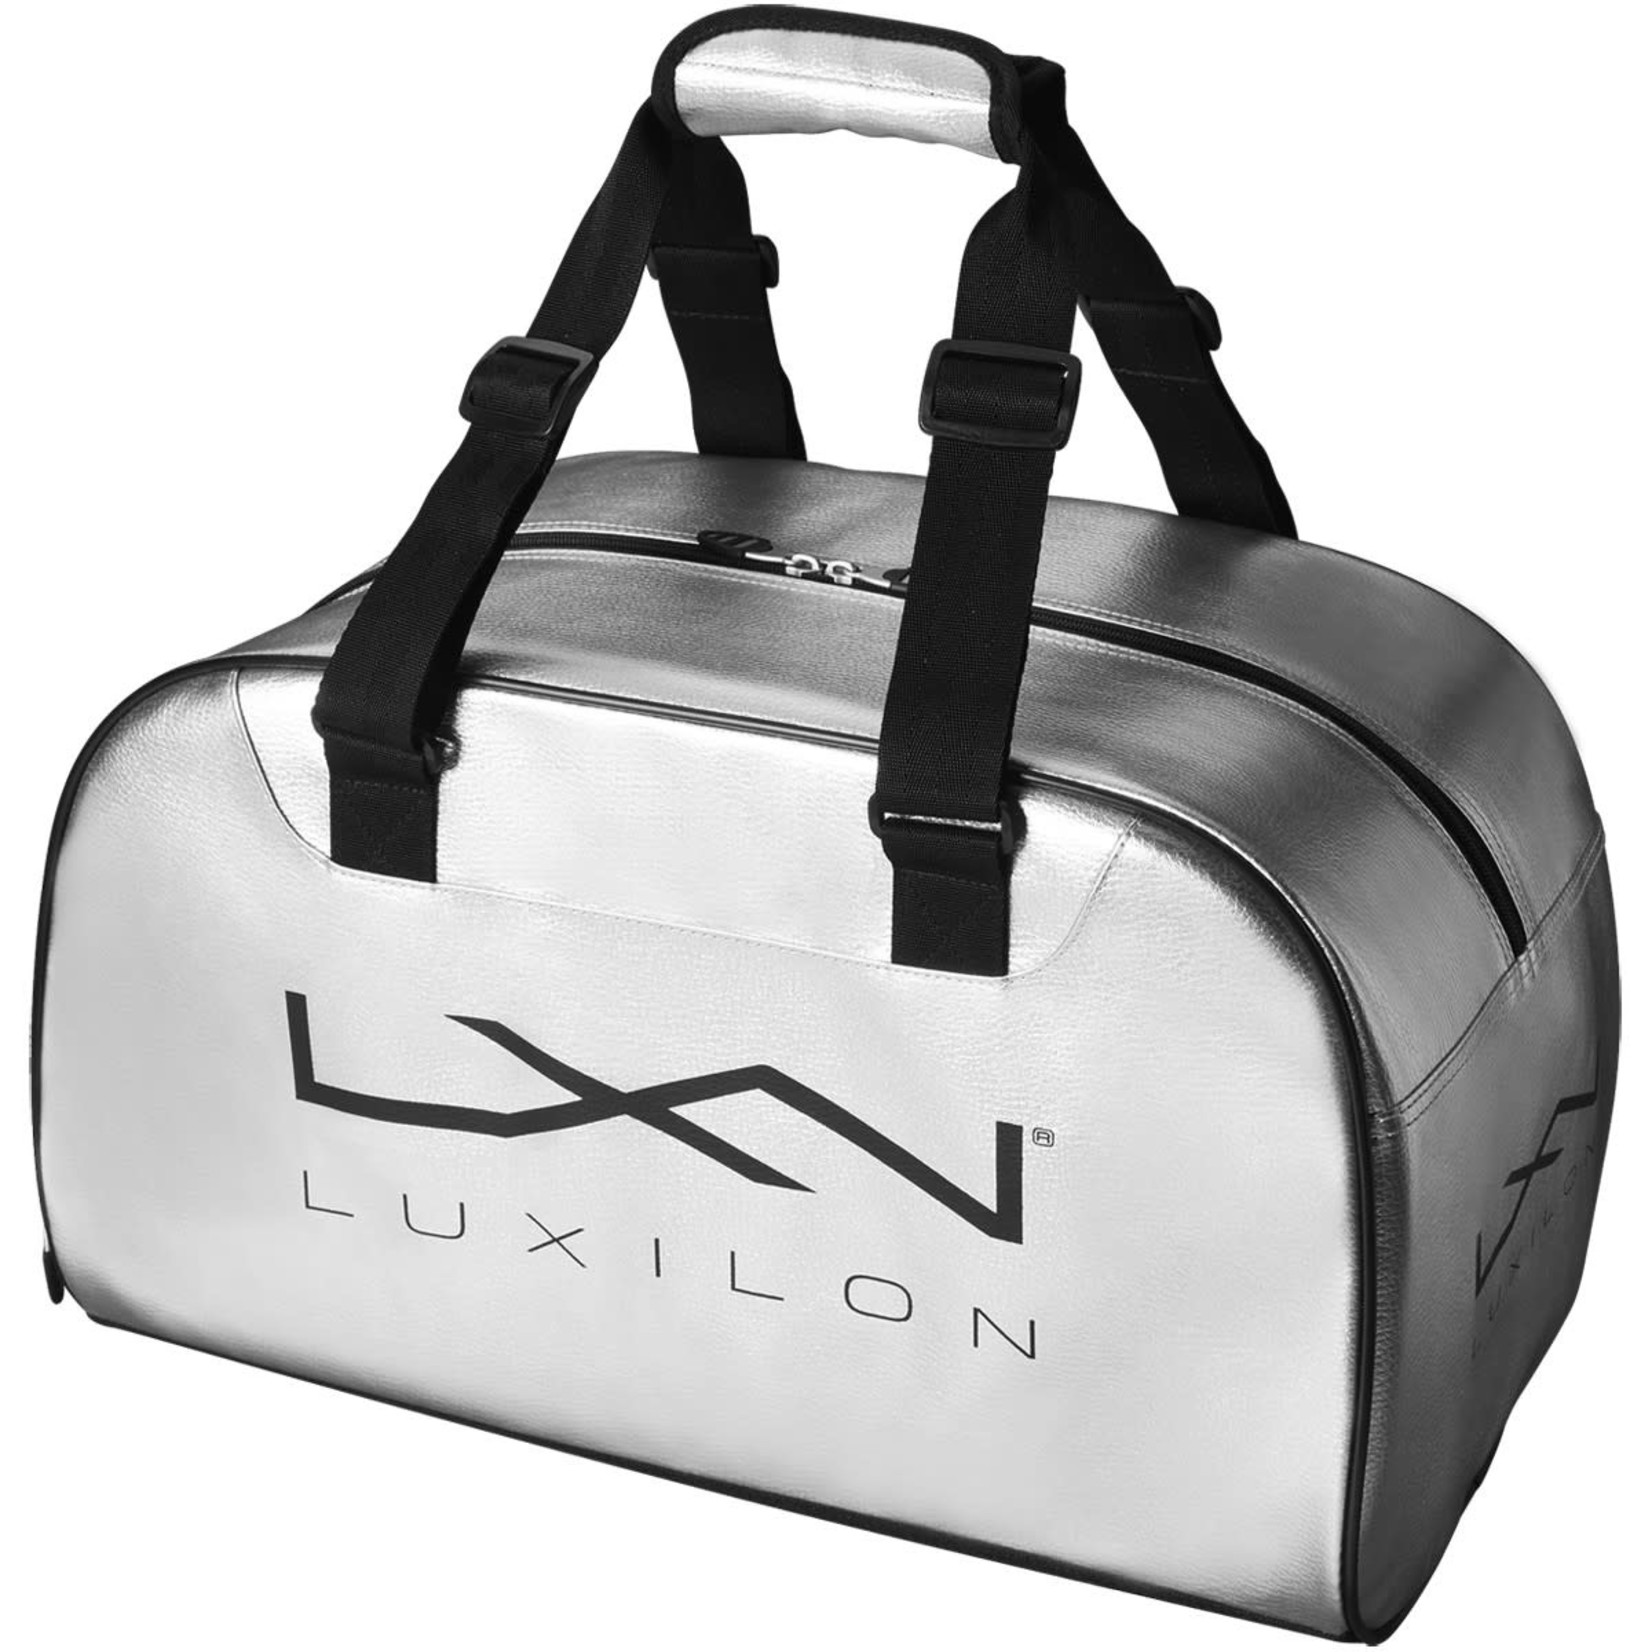 Luxilon Duffel Bag